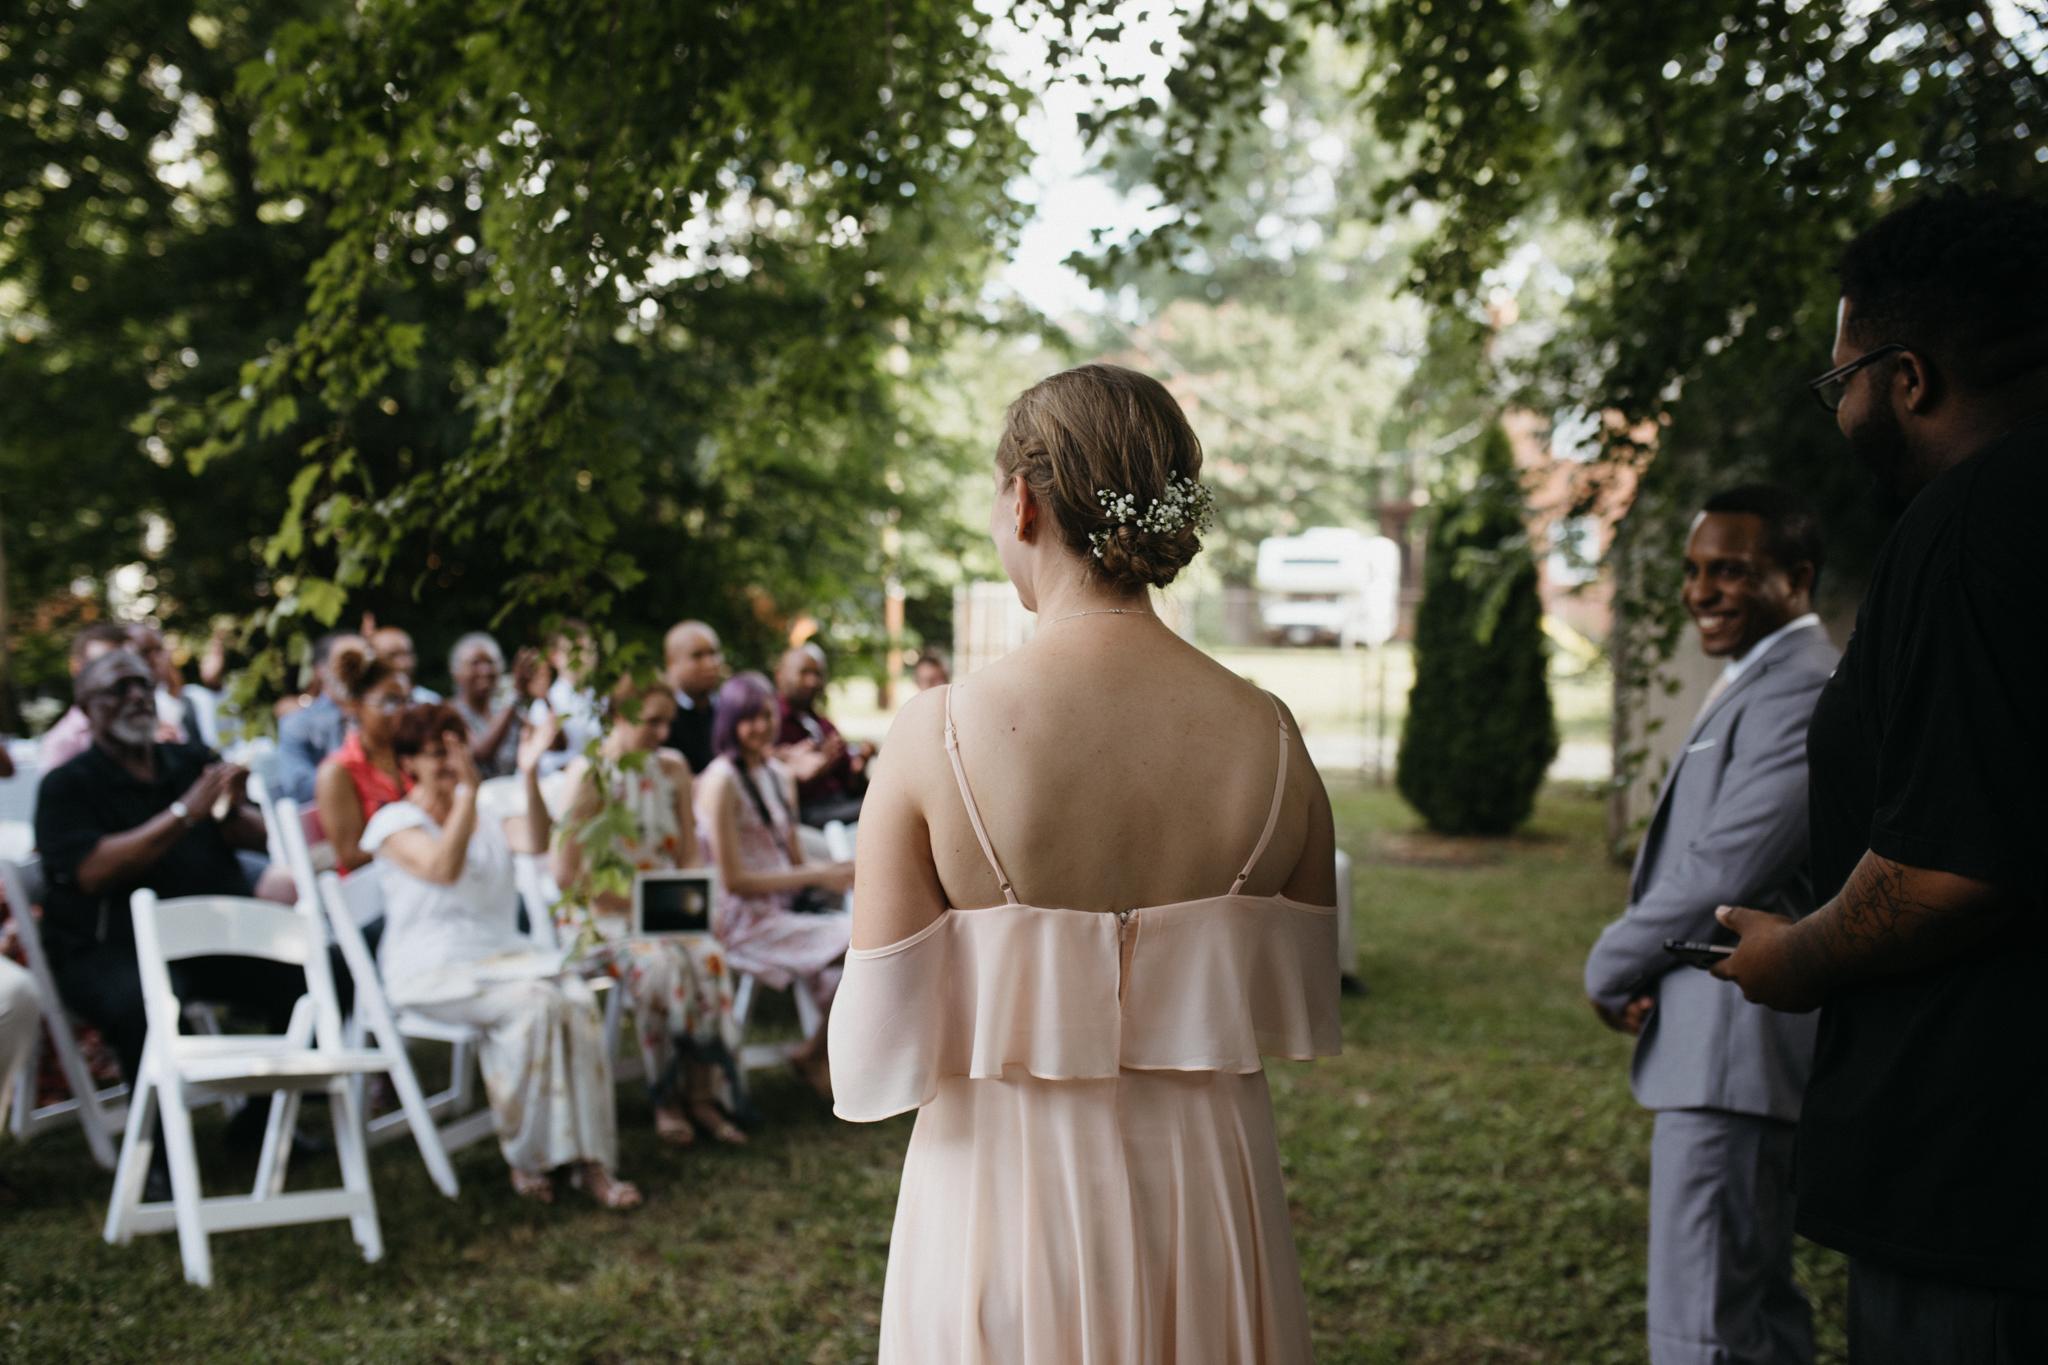 dorota_dwight_richmond_backyard_wedding-46.jpg